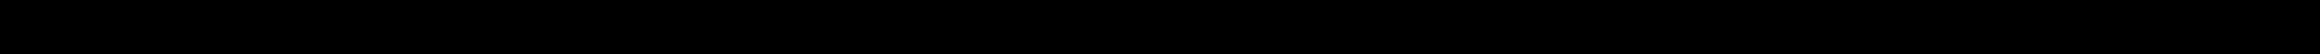 DENSO 36531-P06-A02, 36531-P1K-E01, 36531-P2J-J01, 36531-P2Y-G01, 36531-P64-003 Lambdatunnistin